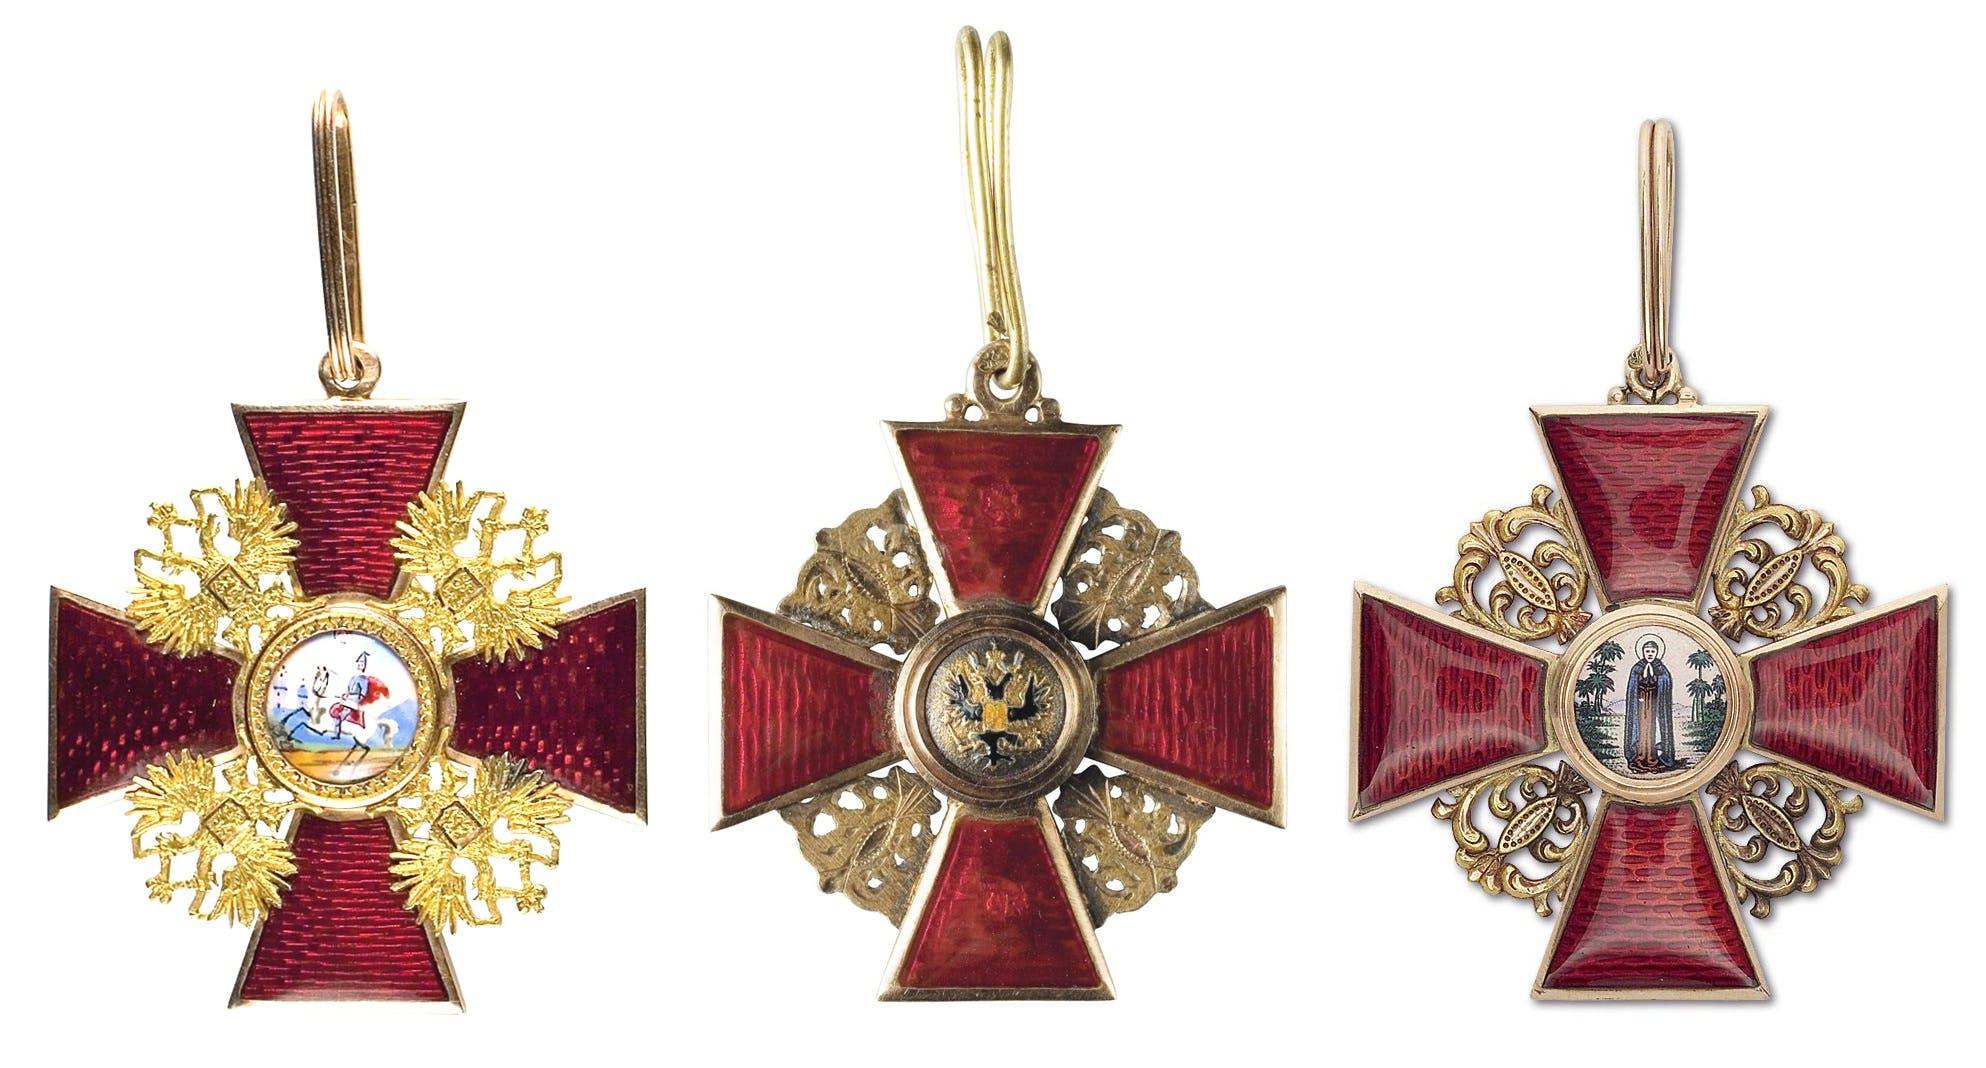 Free stock photo of cross, decoration, history, golden